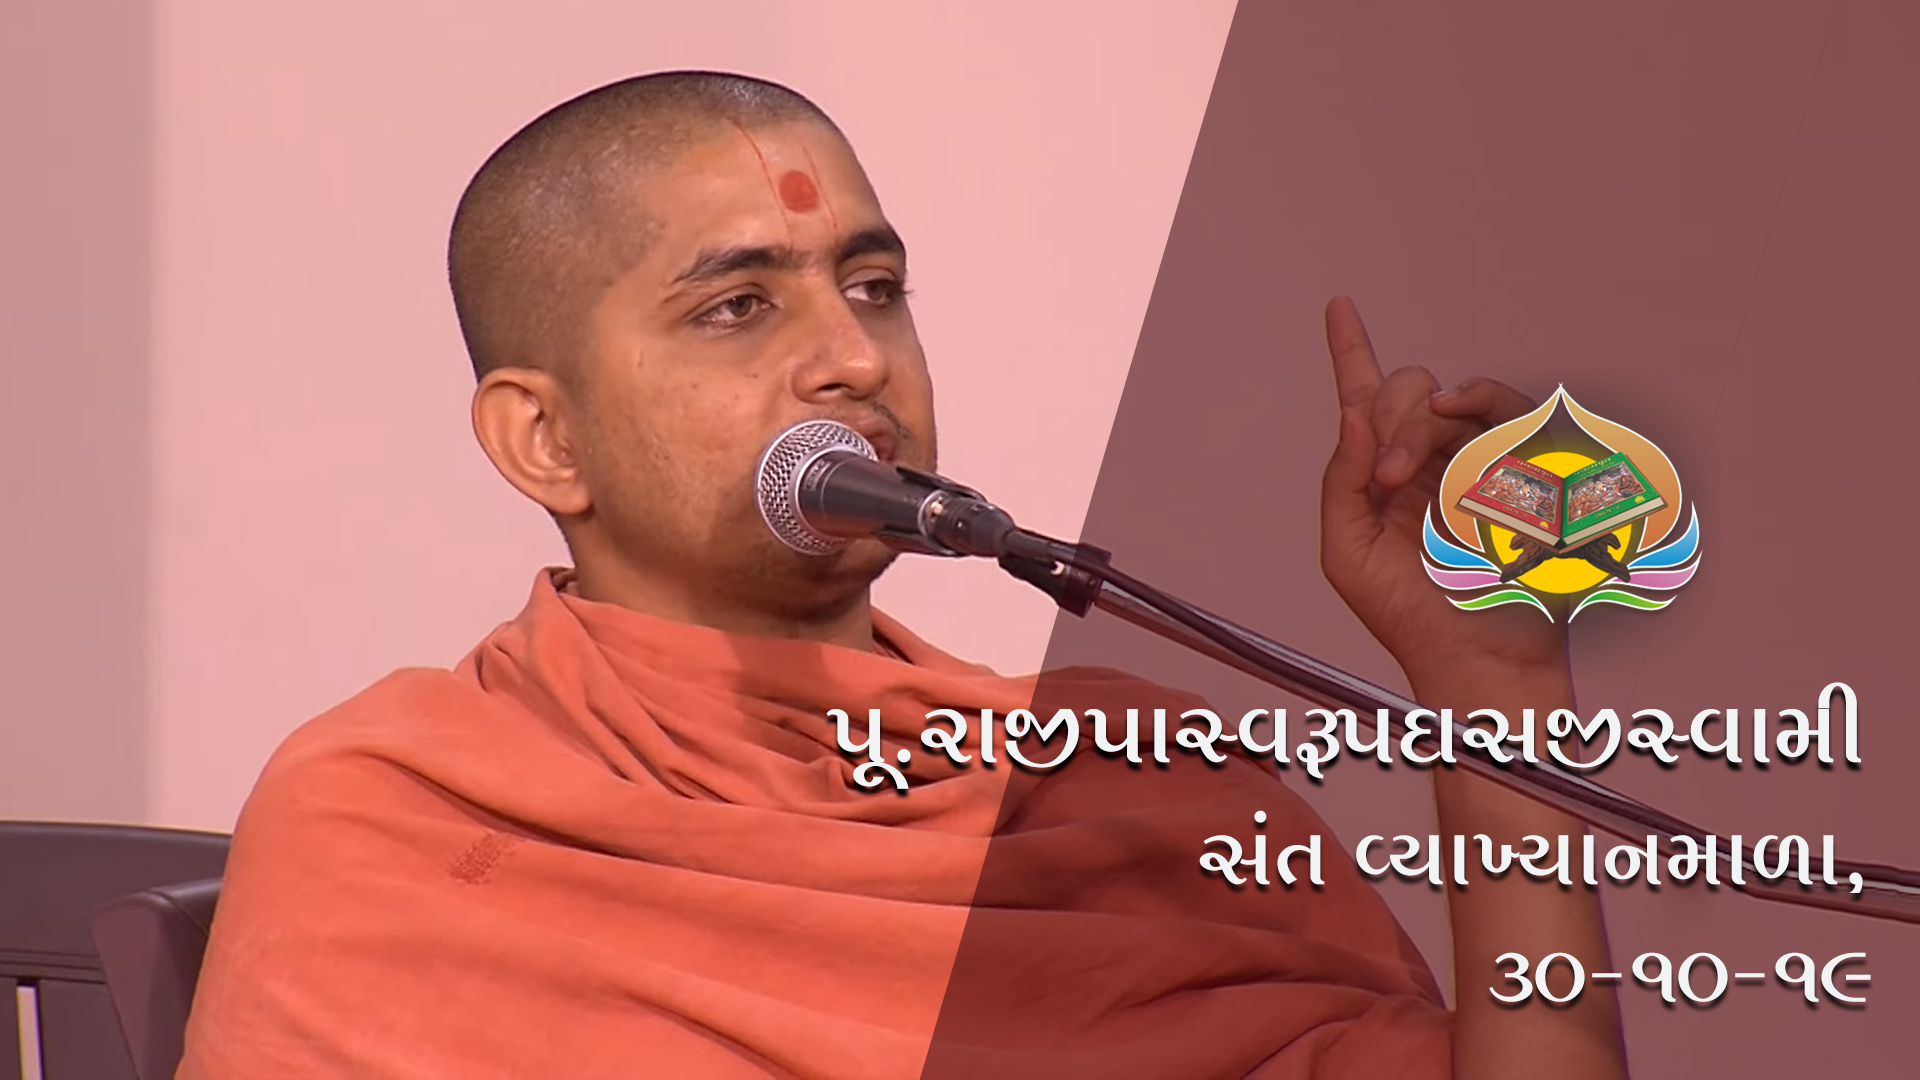 P.Rajipaswaroopdasjiswami | Sant Vyakhyan Mala | Vachanamrut Dwishatabdi Mahotsav & Gyansatra 13